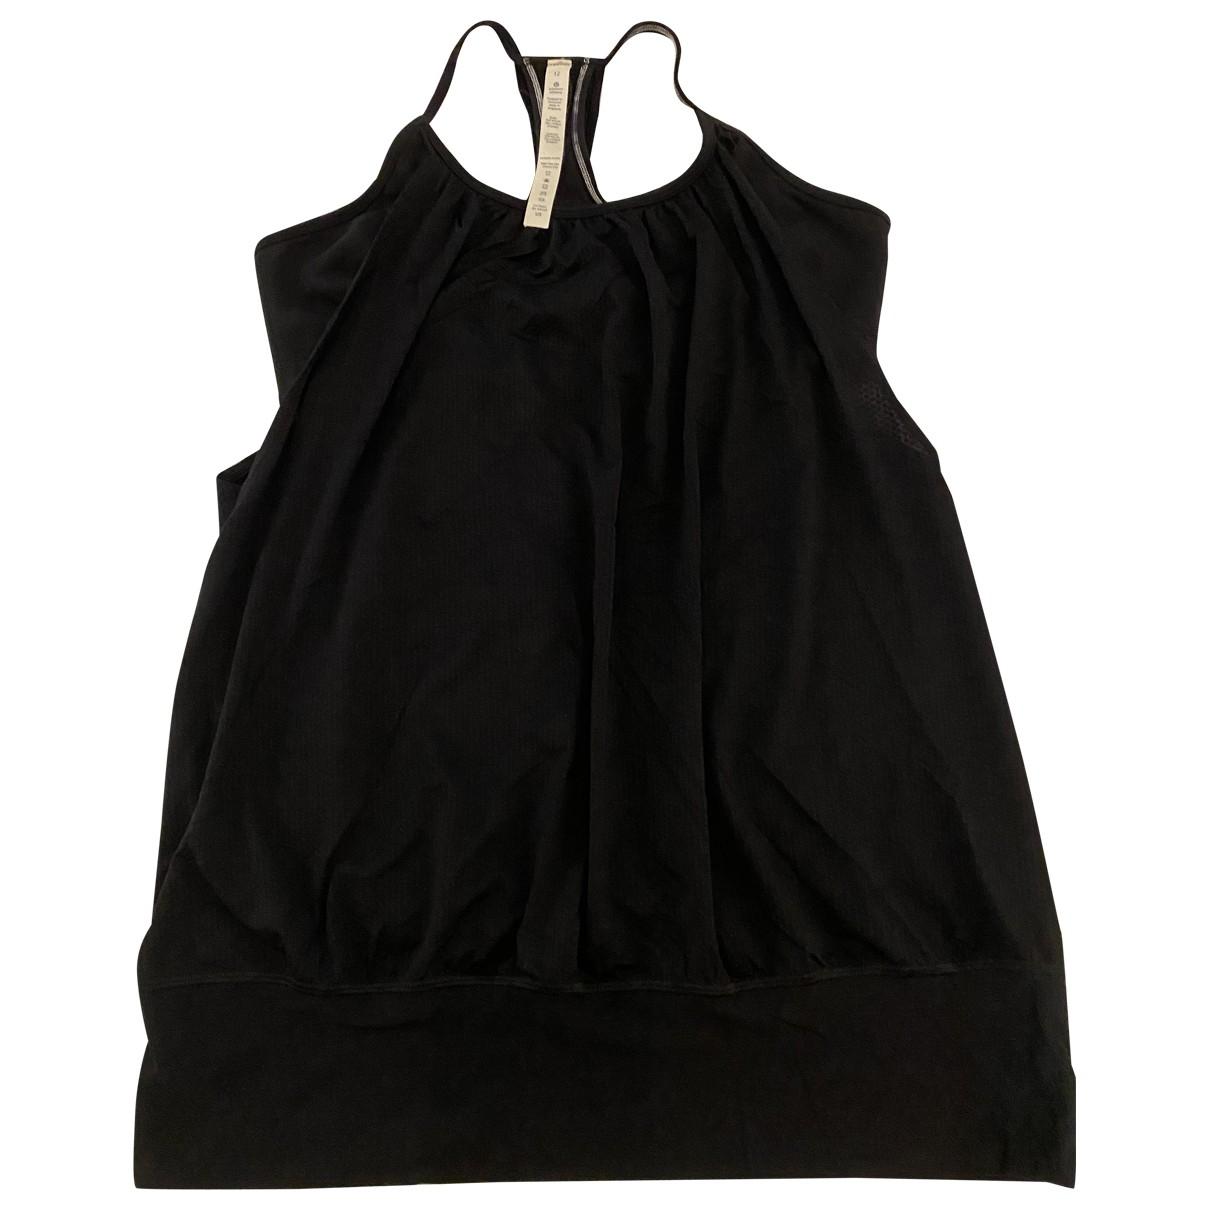 Lululemon \N Top in  Schwarz Polyester